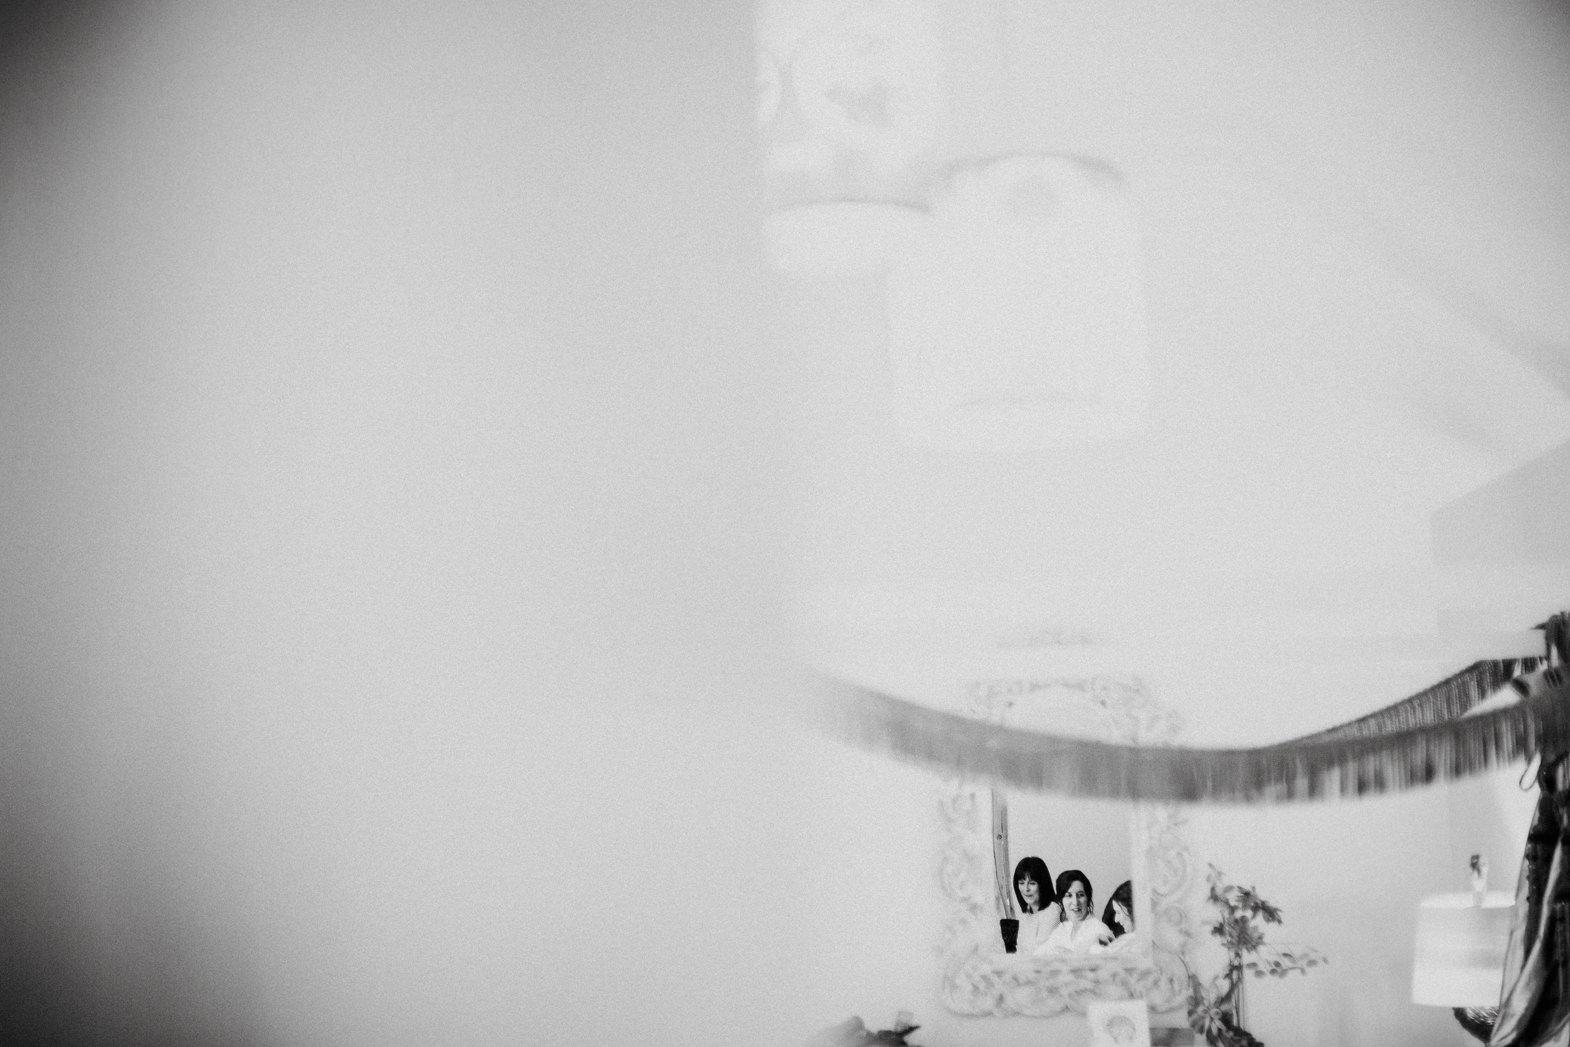 WEDDING PHOTOGRAPHy AT LOWER BARN (20).jpg